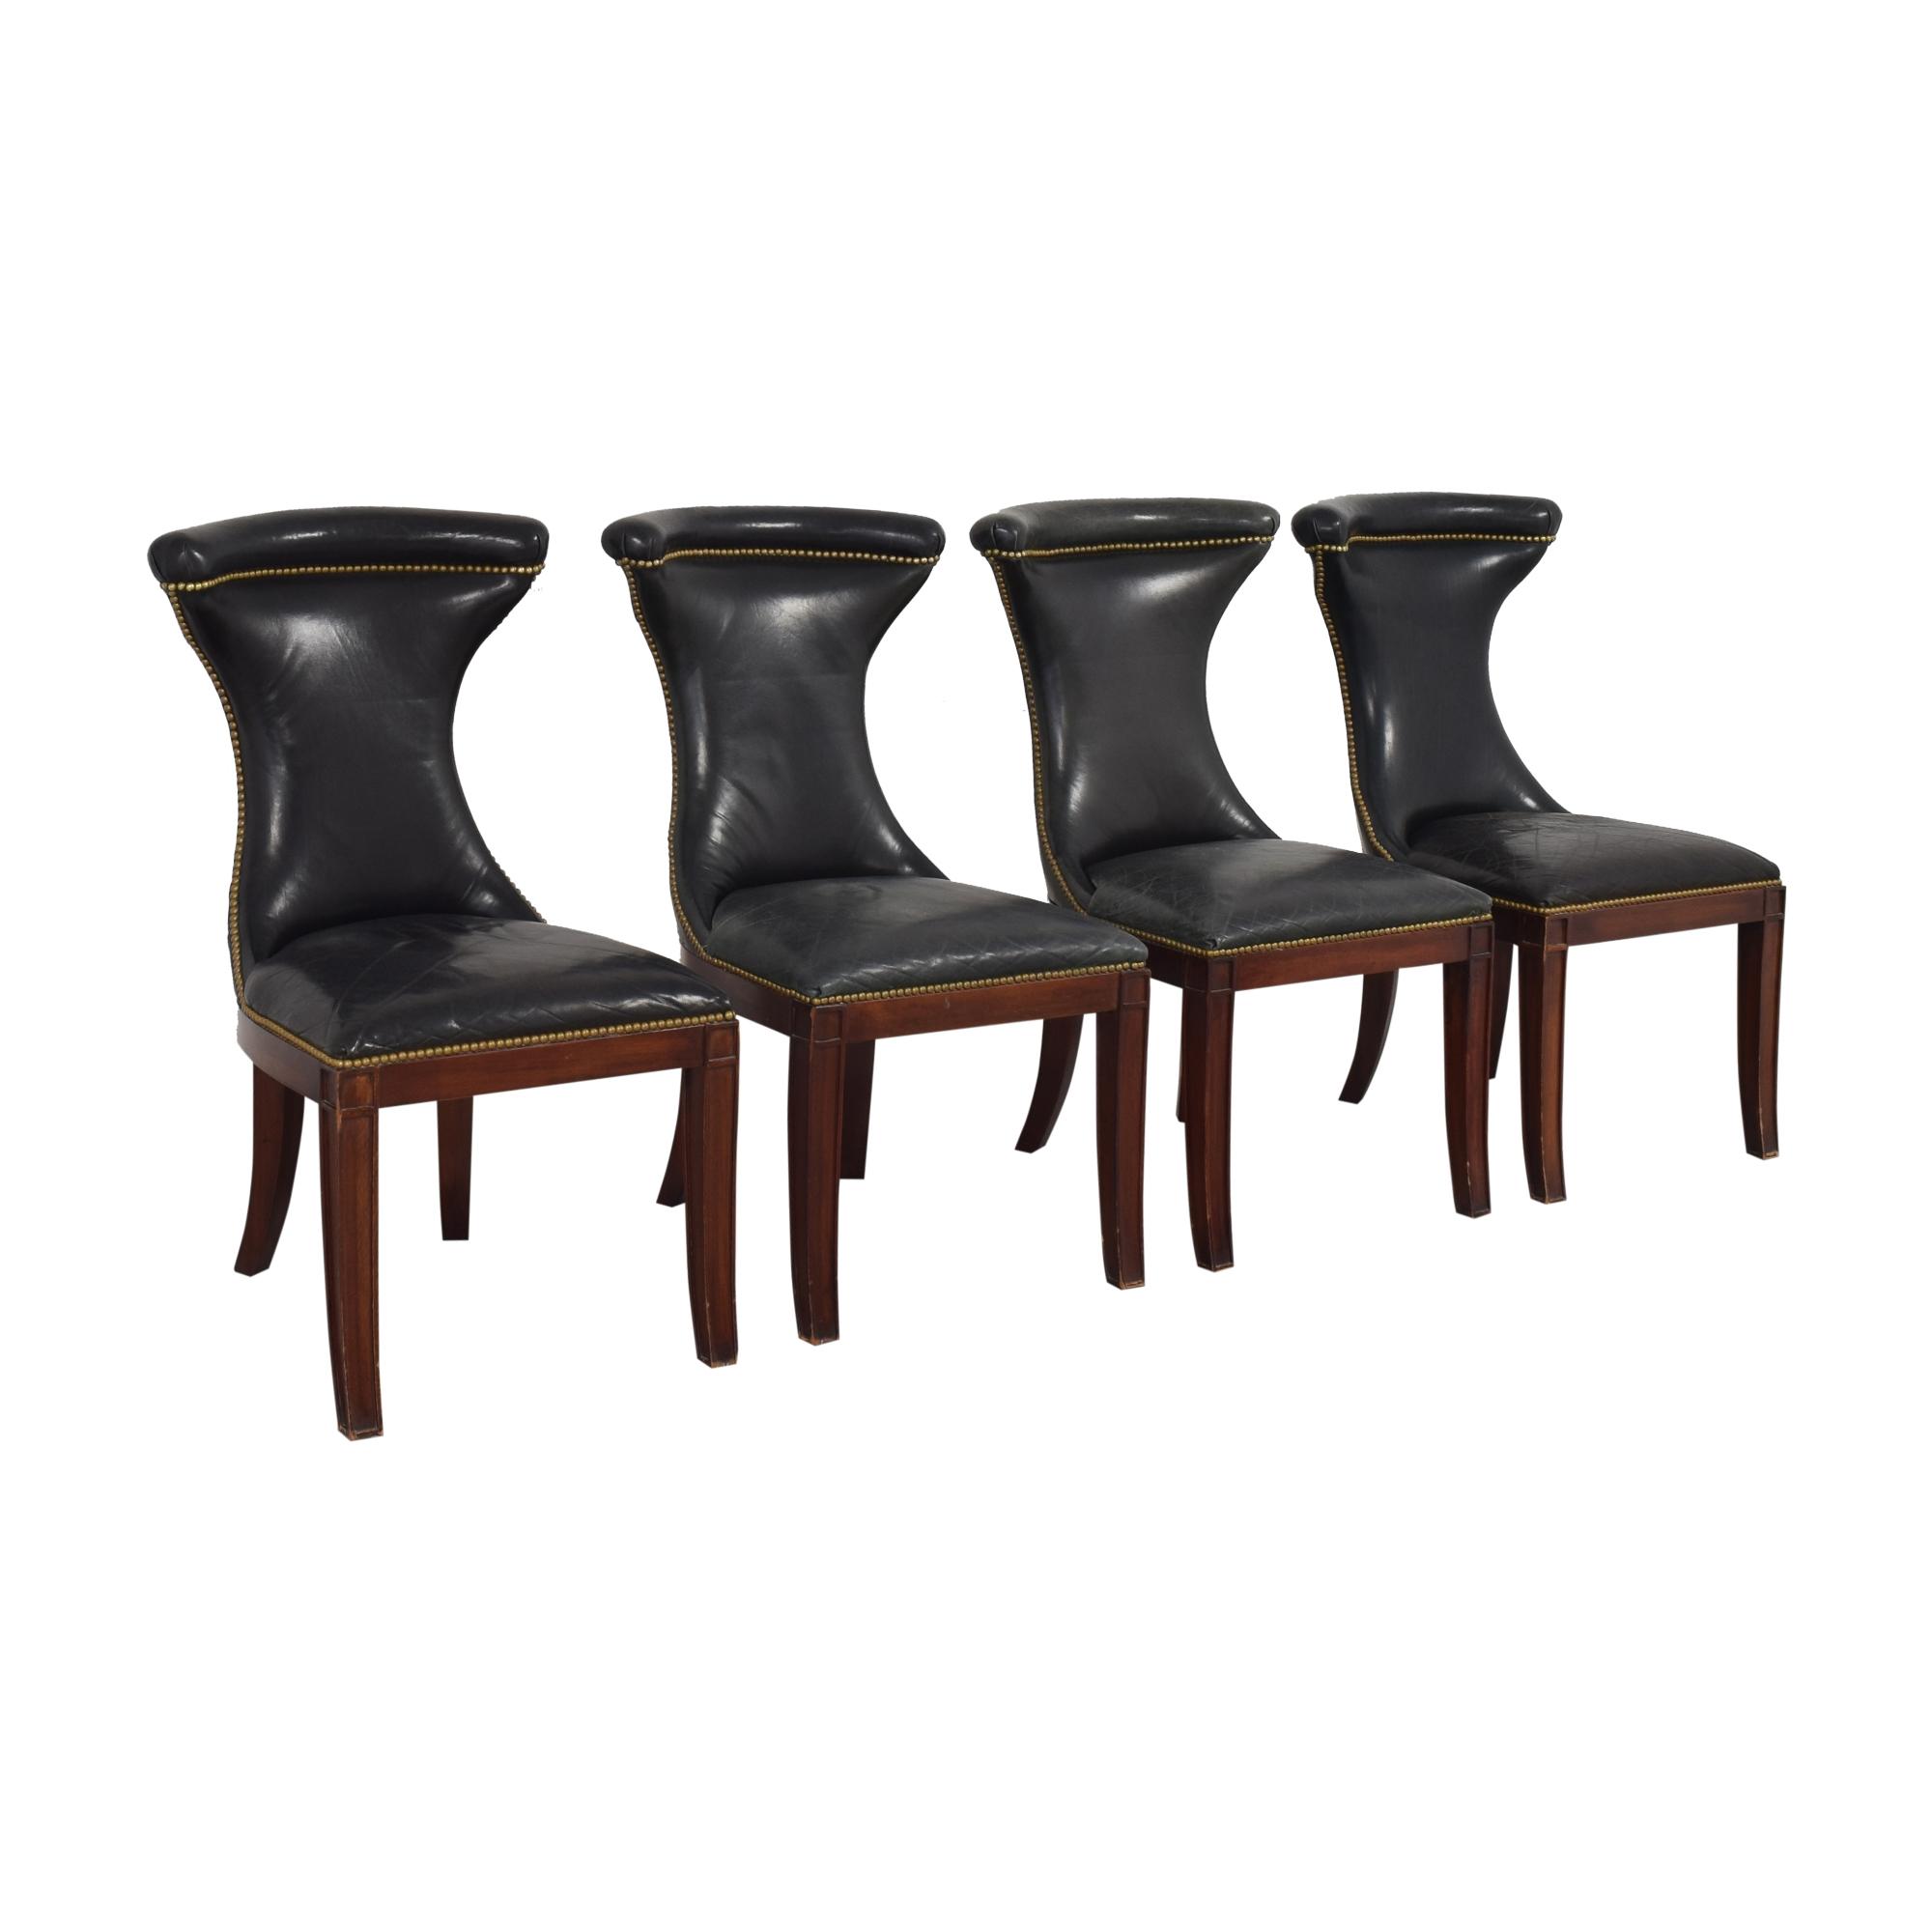 Ralph Lauren Home Ralph Lauren Nailhead Trim Dining Chairs discount